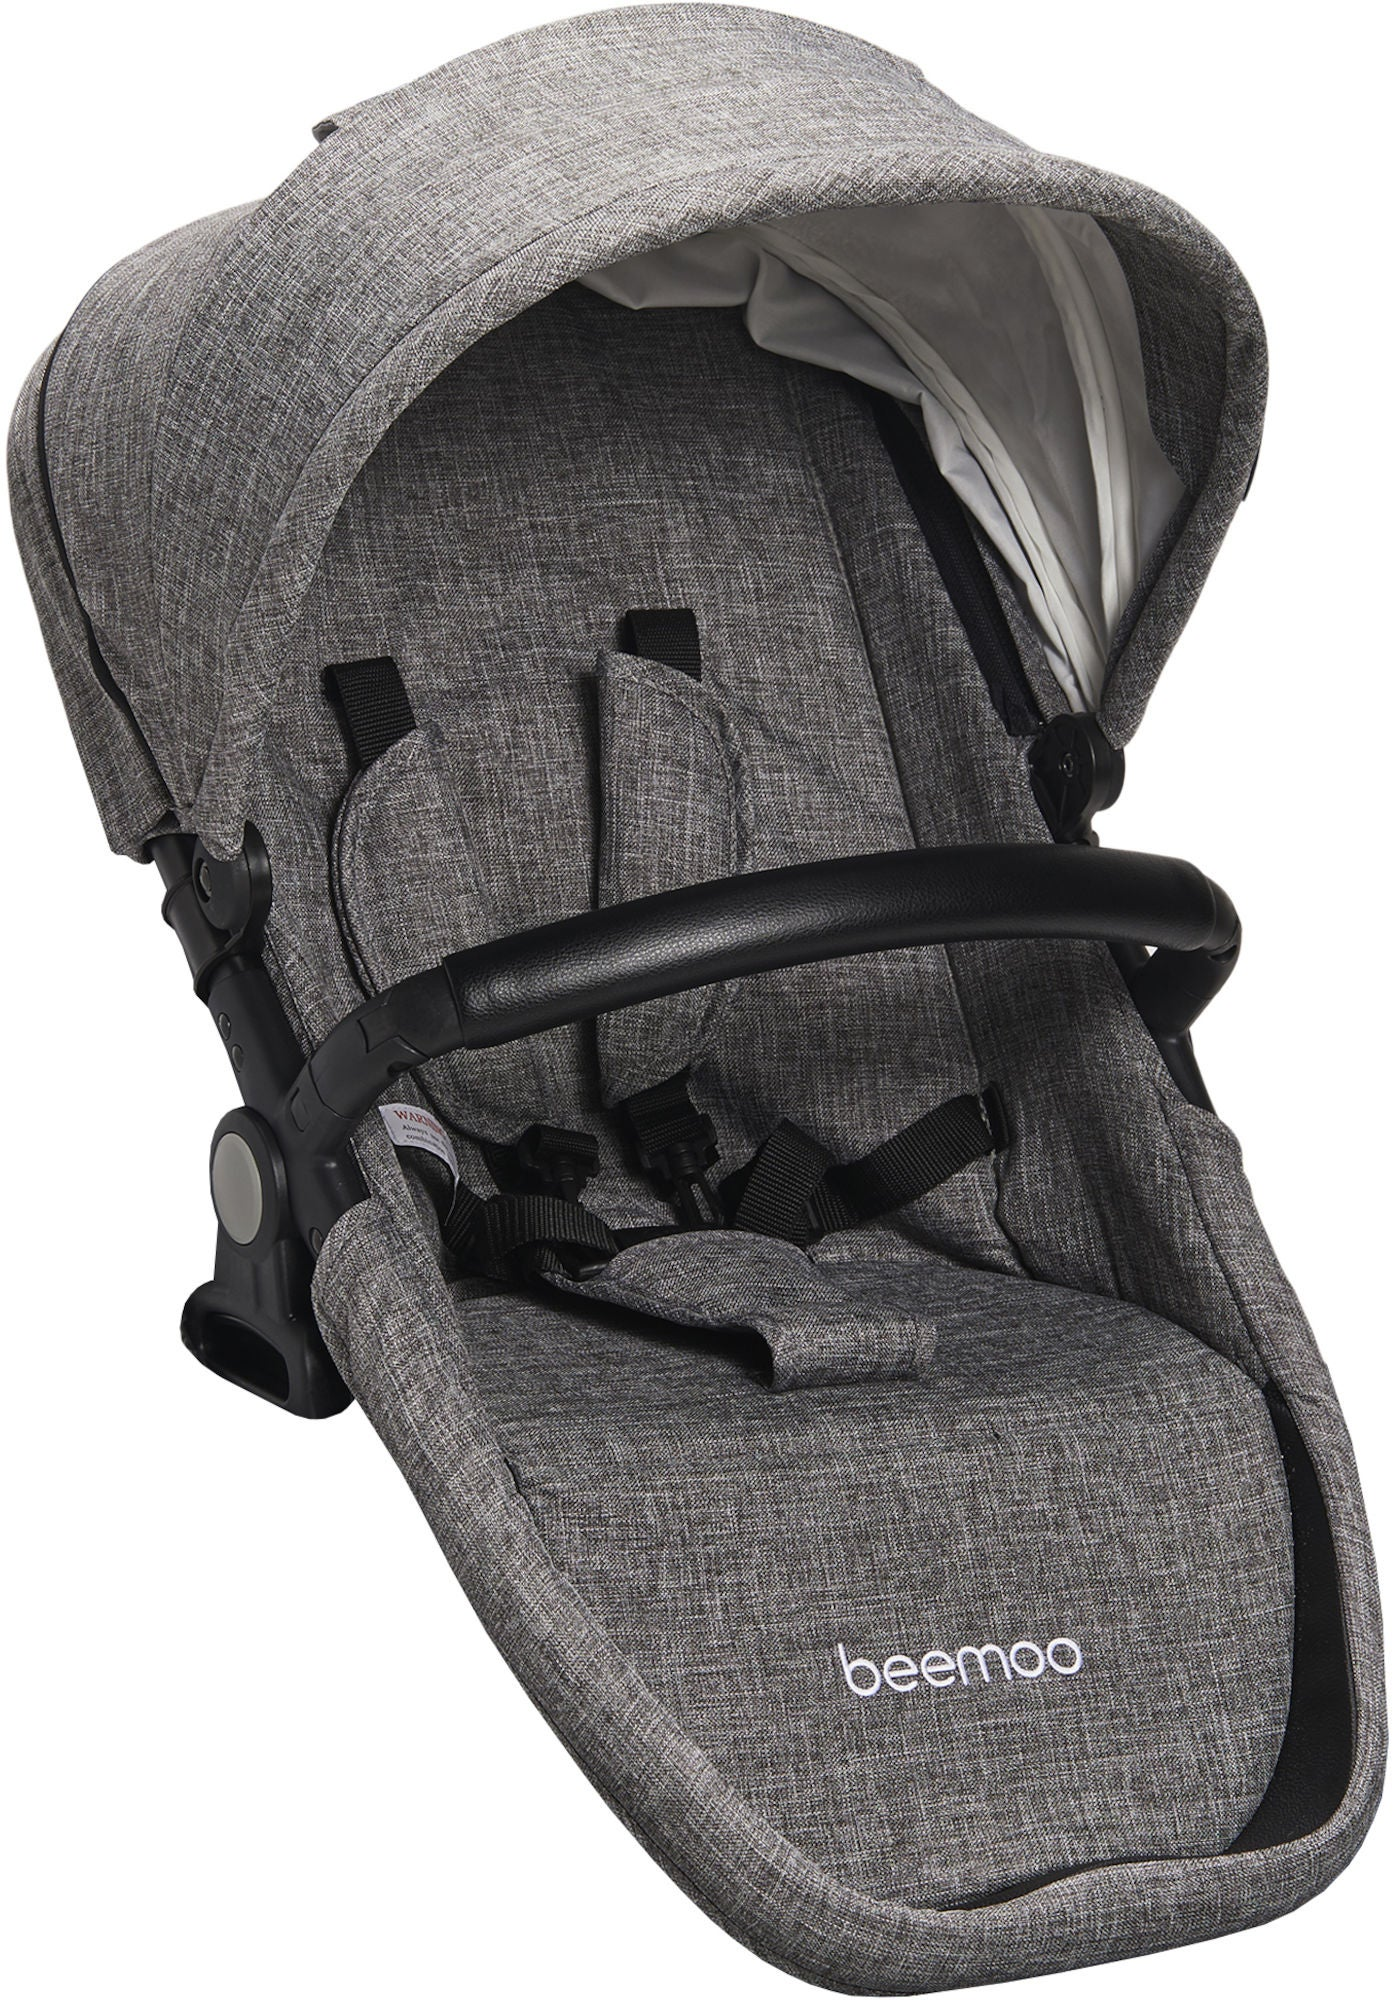 Beemoo Maxi Travel Lux II Sittdel, Silver/Grey Melange